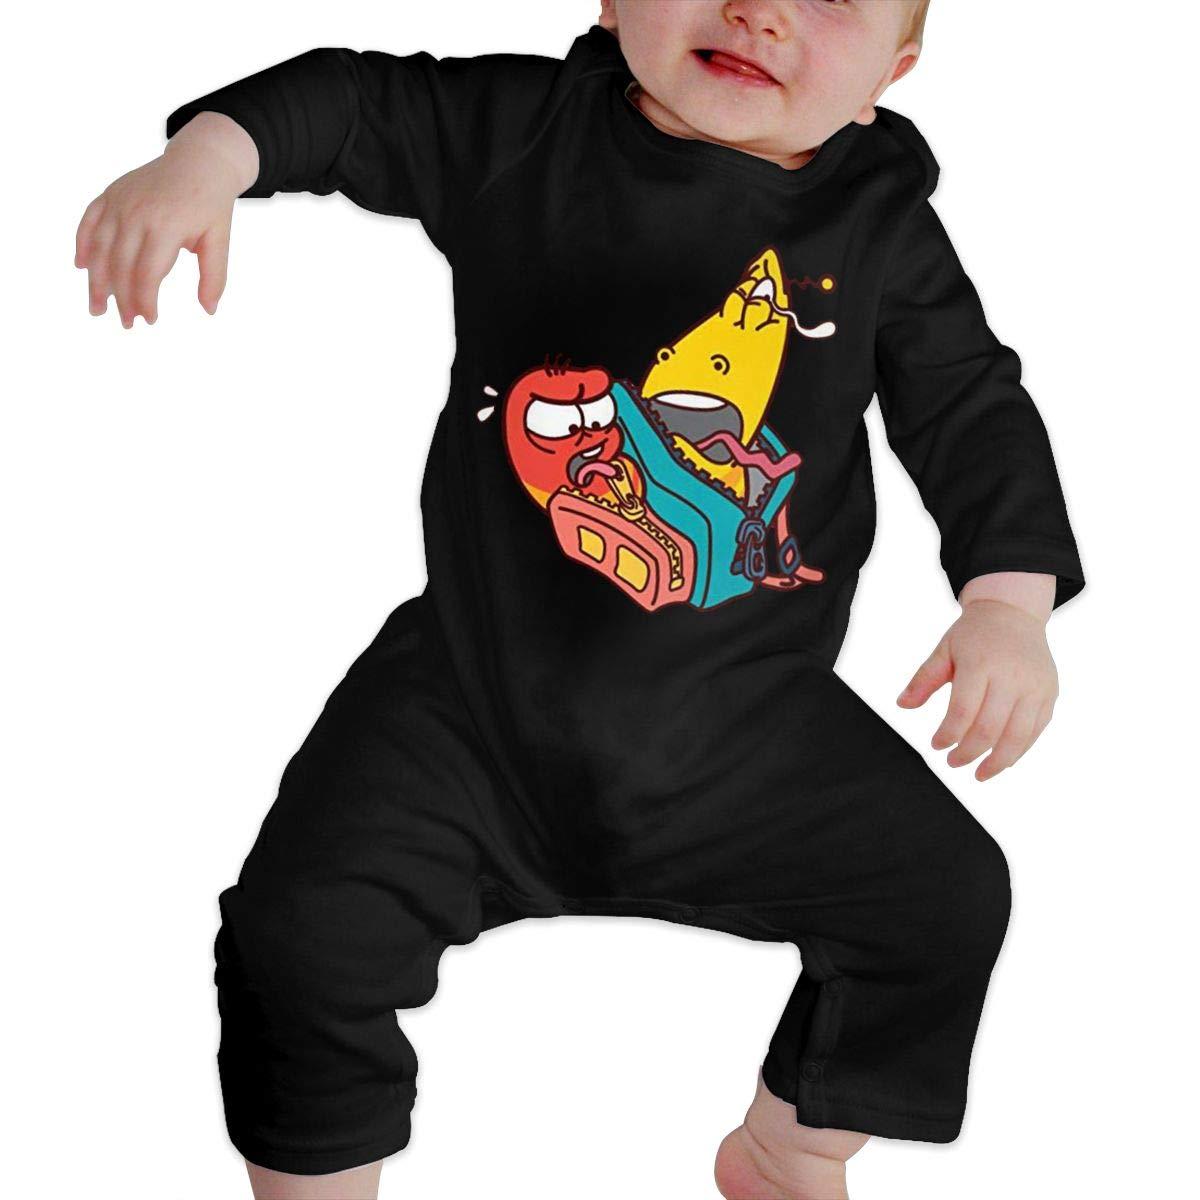 SININIDR Newborn Jumpsuit Infant Baby Girls Cartoon Larva Long-Sleeve Bodysuit Playsuit Outfits Clothes Black